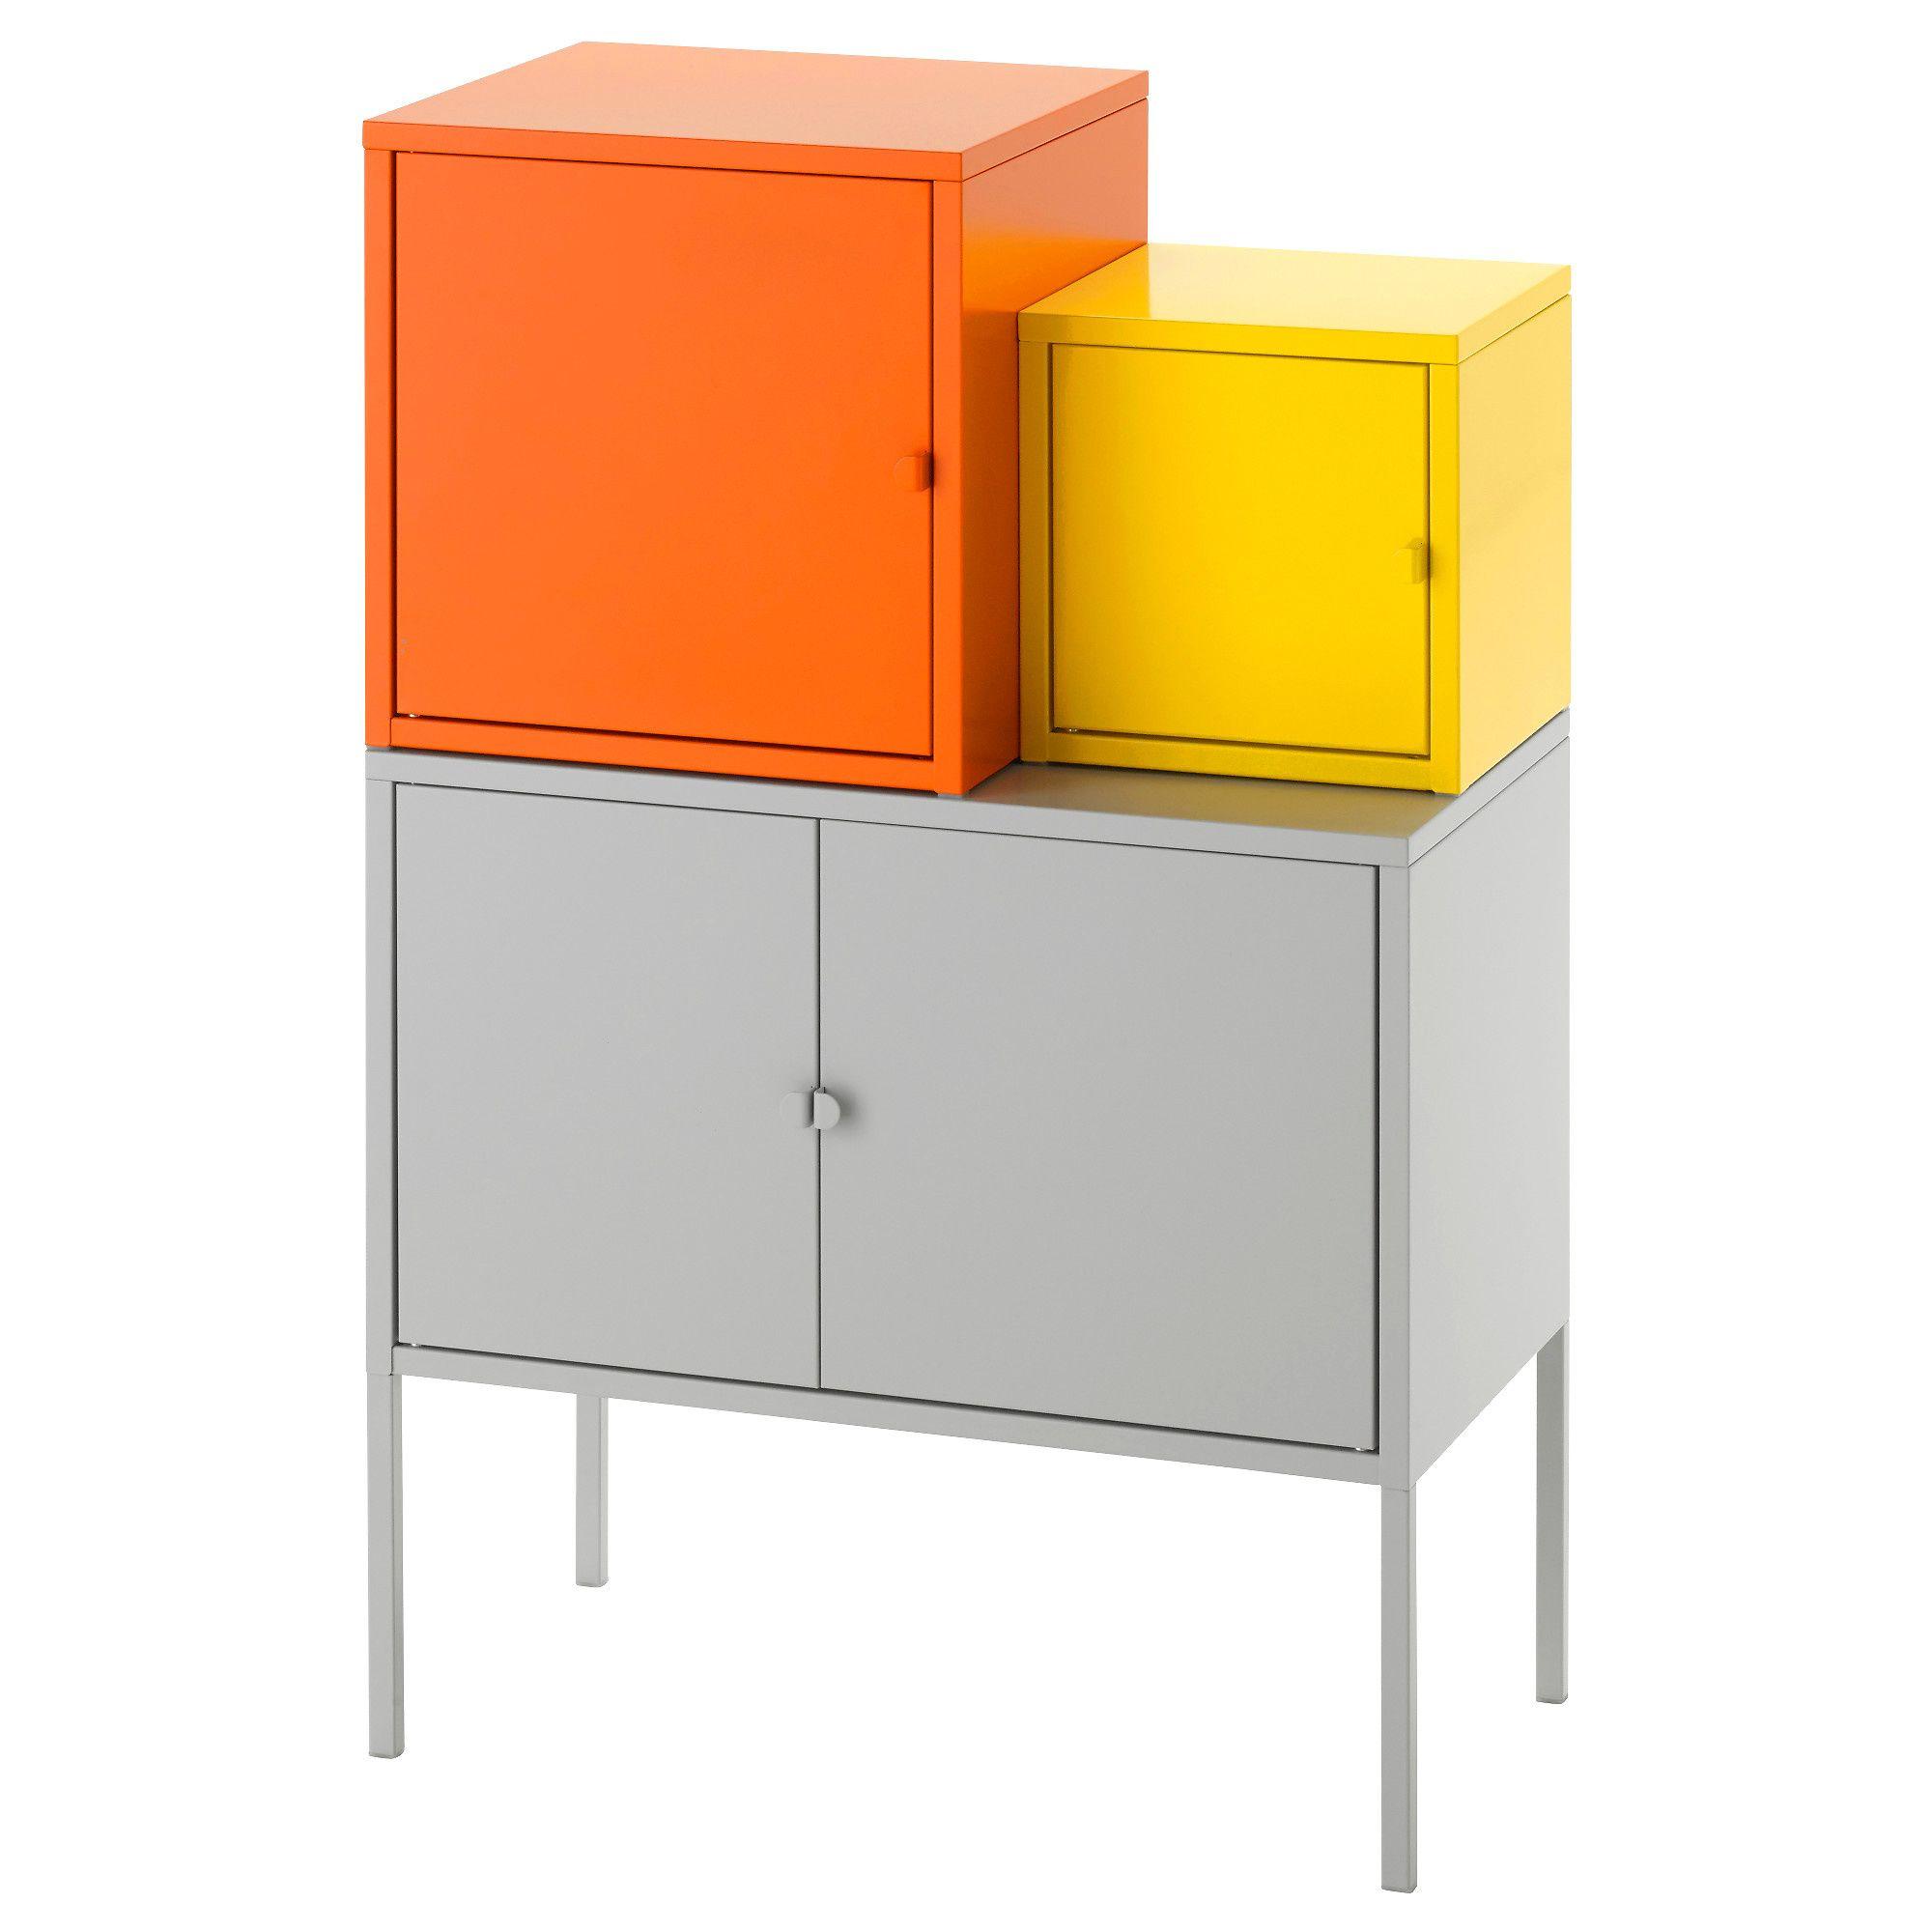 11 Majestic Ikea Casier Metal Meuble Ikea Storage